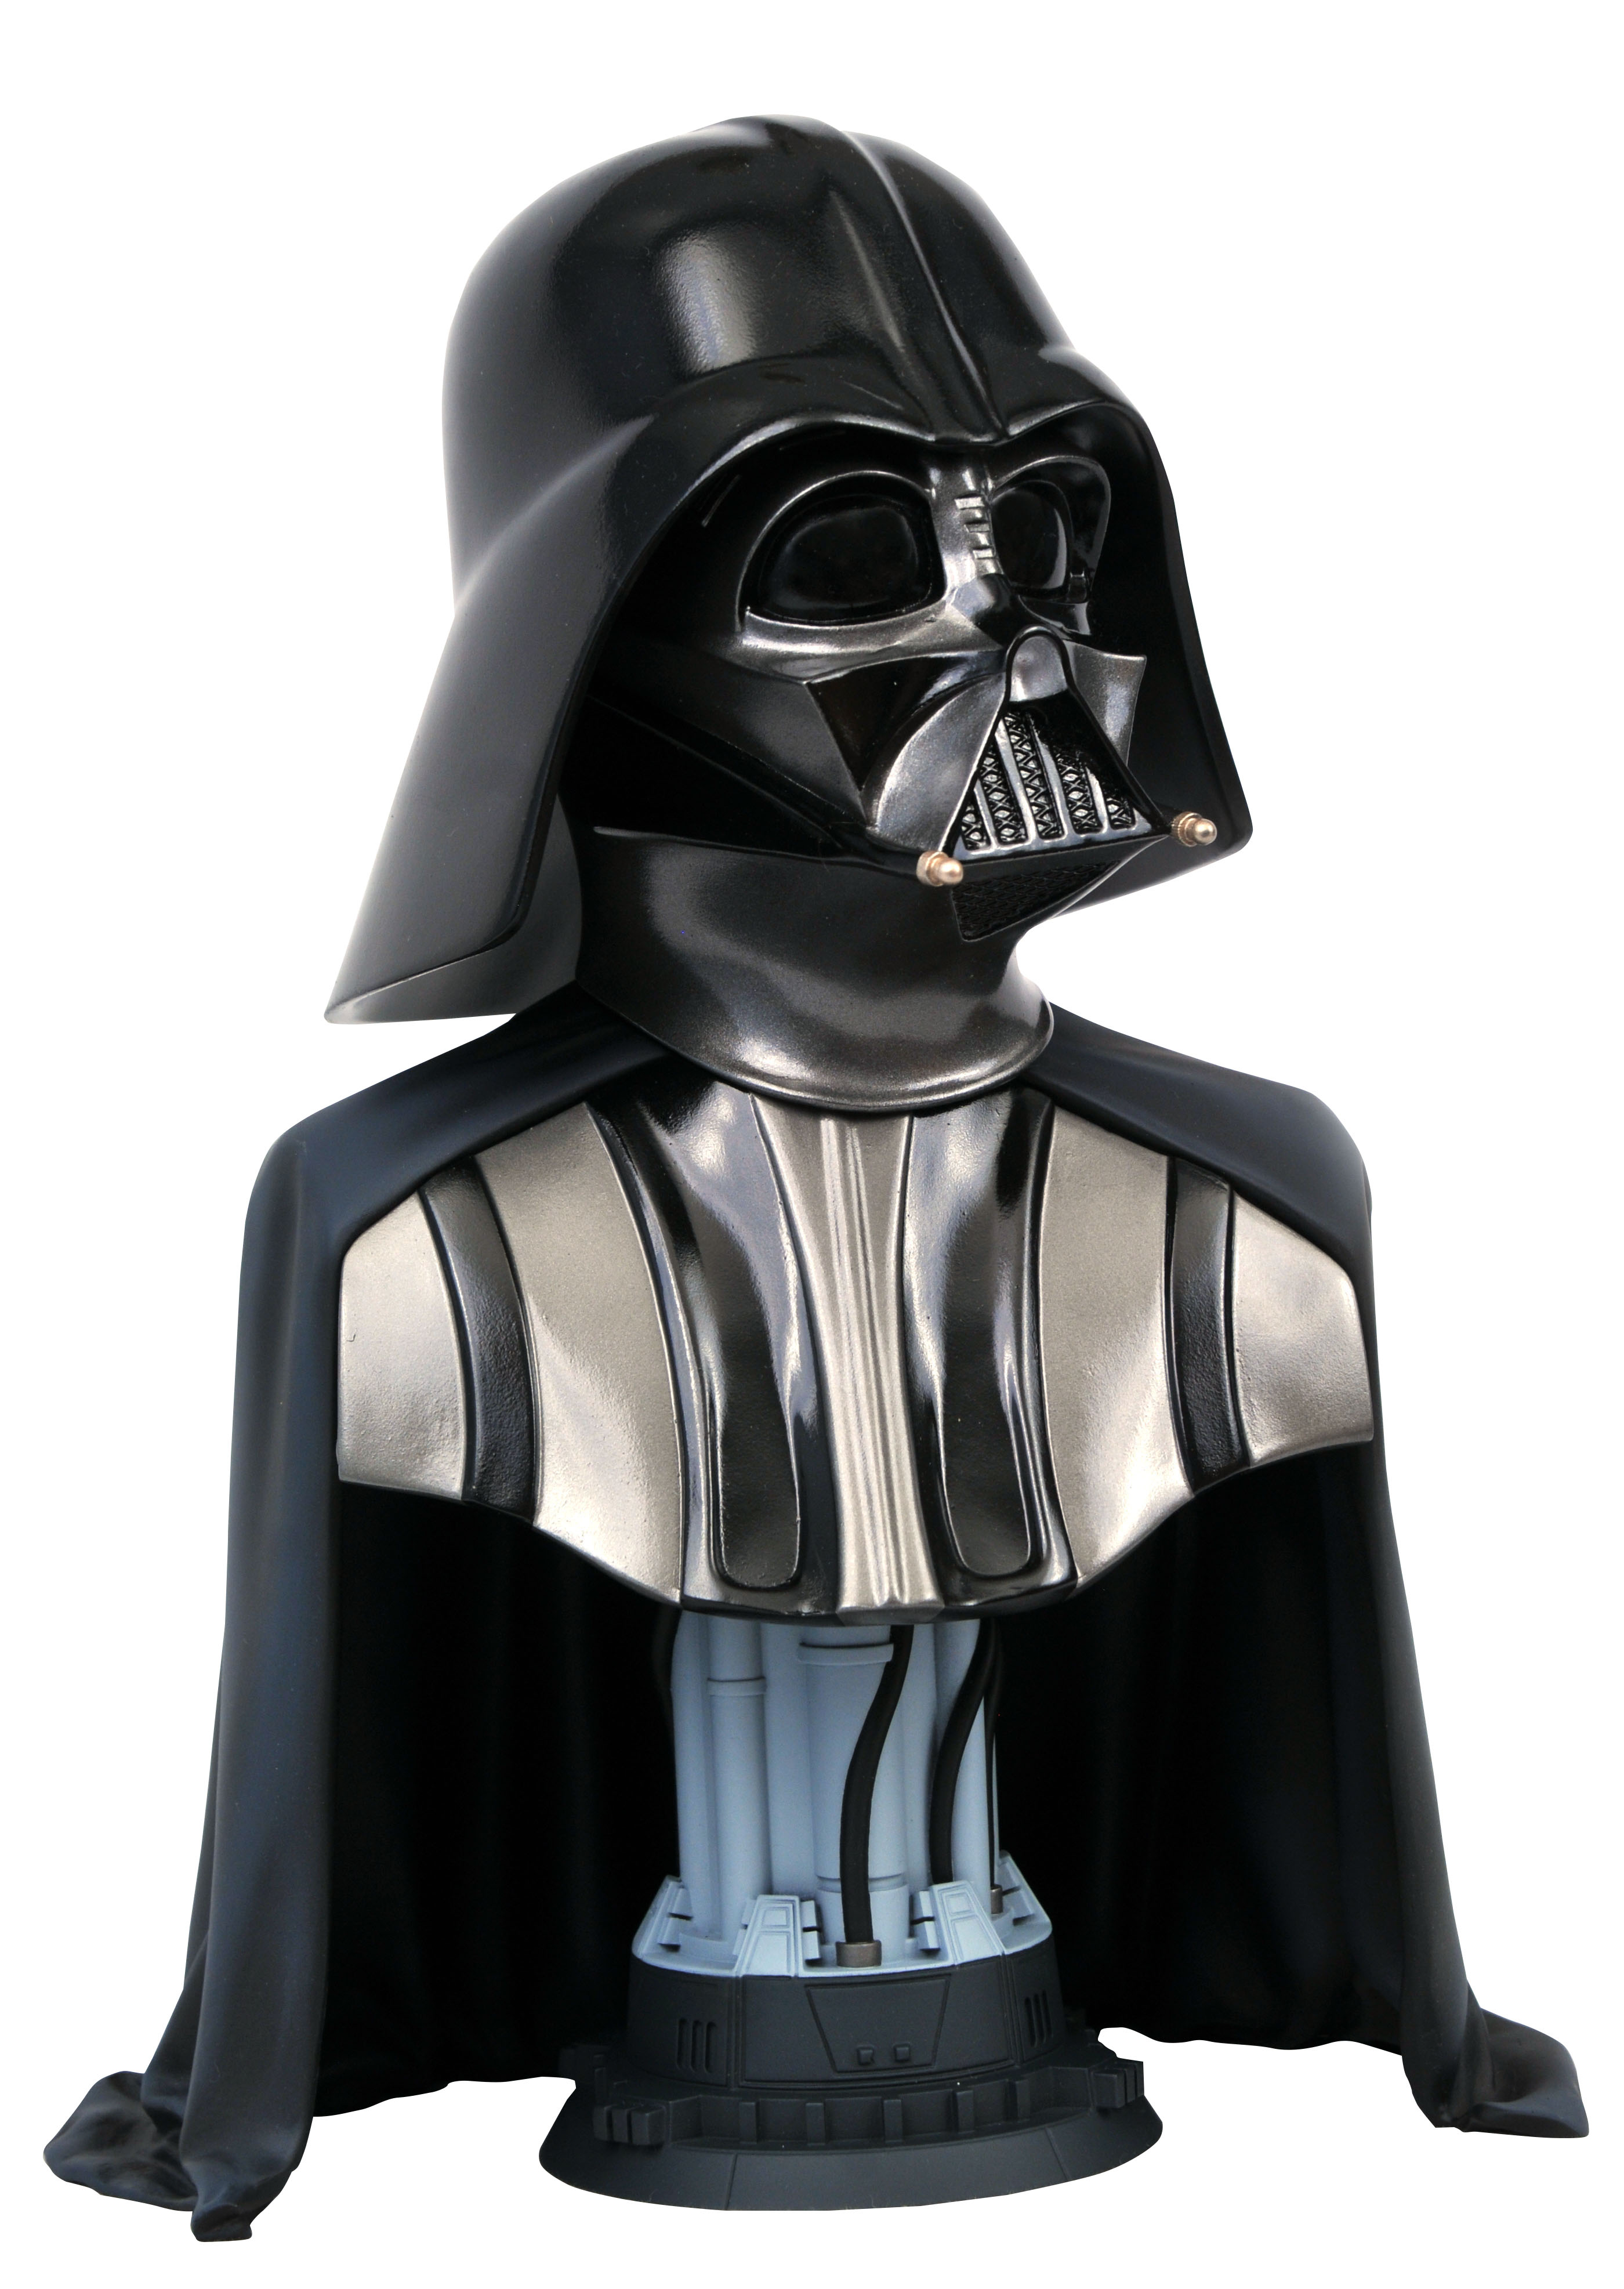 Legends in 3D - Star Wars - Darth Vader 1/2 Scale Bust